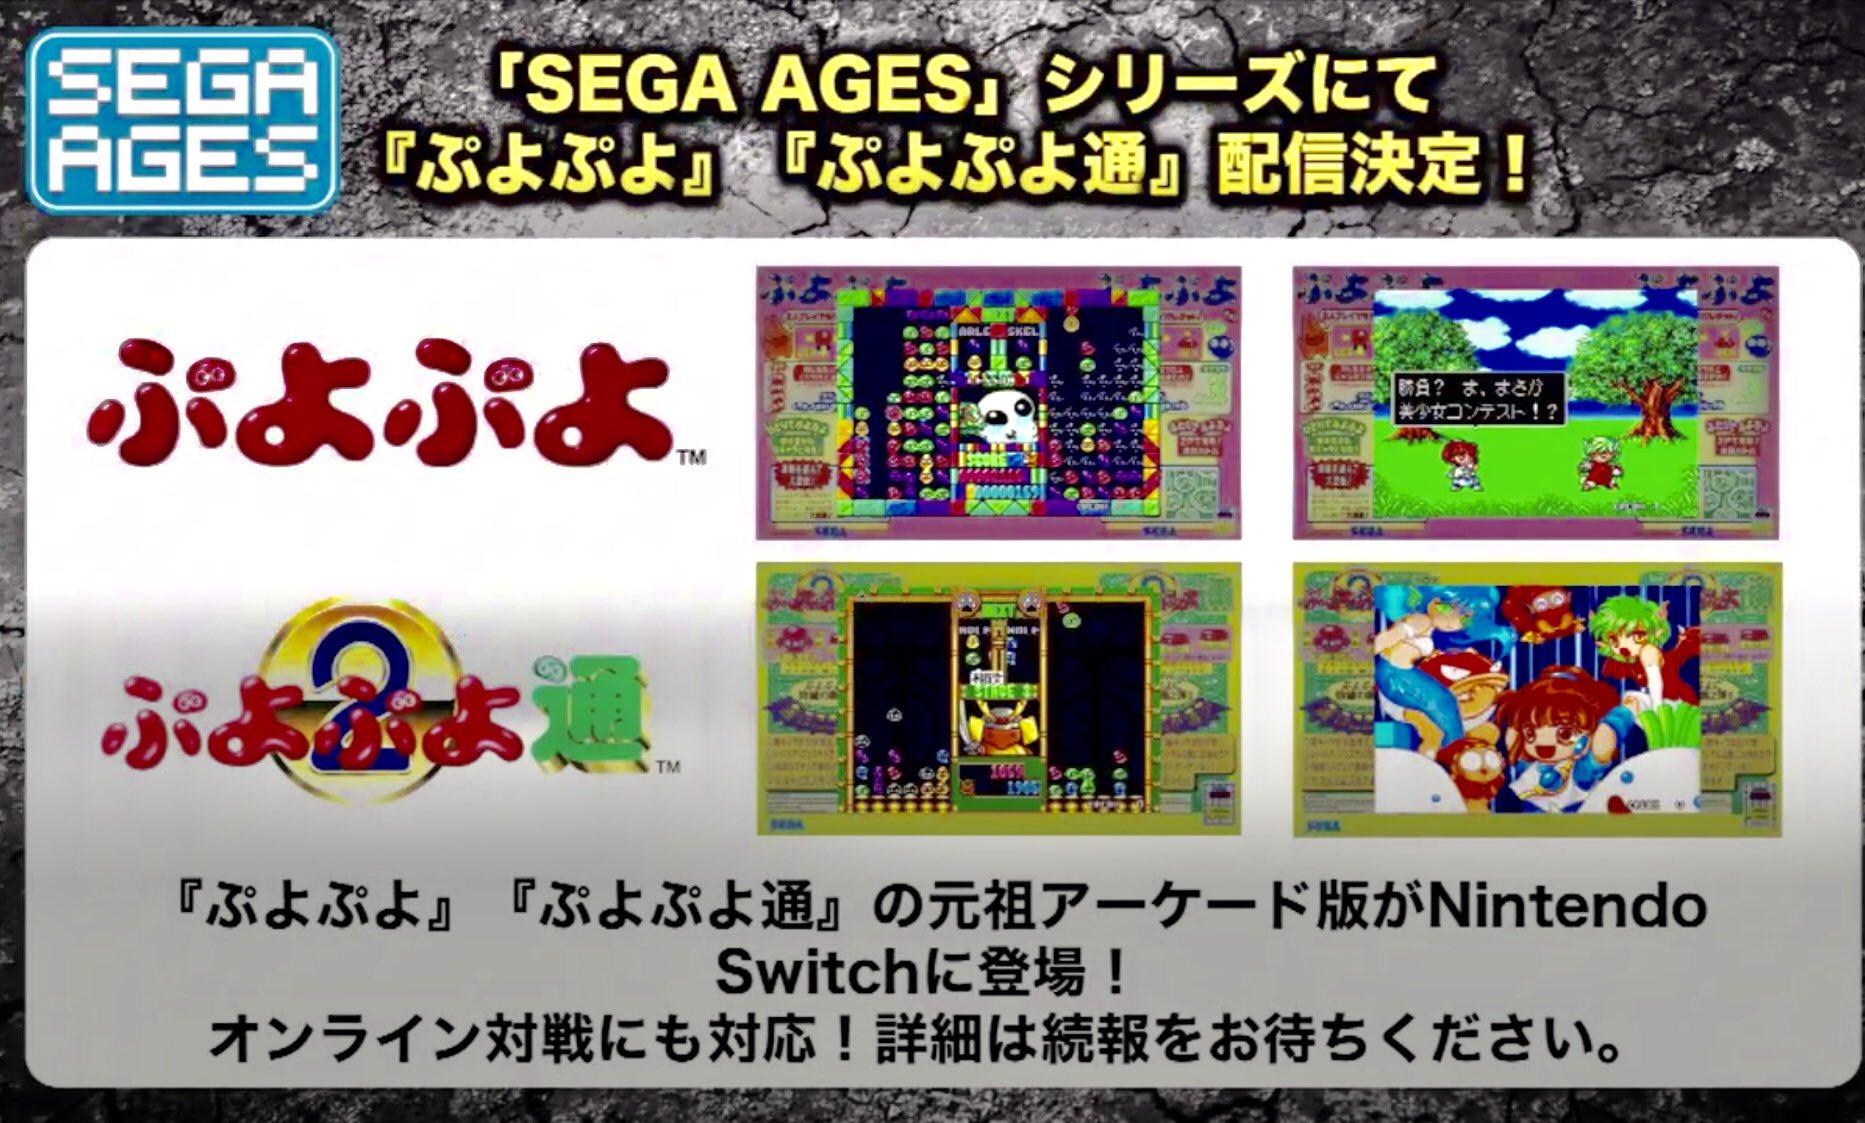 Sega-Ages-Puyo-Puyo_12-16-18.jpg